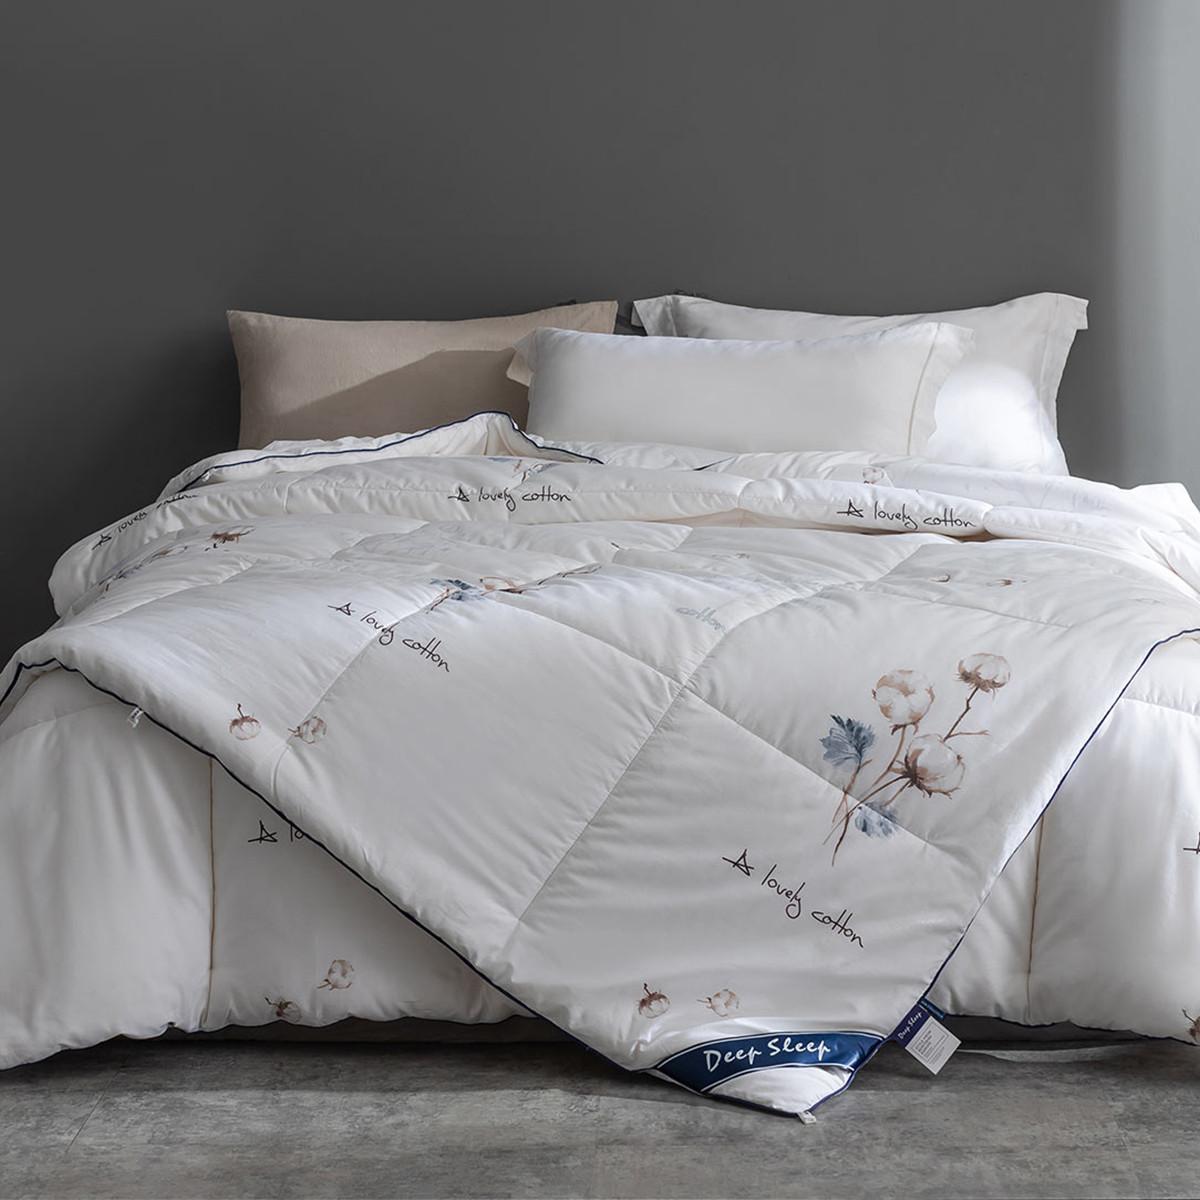 Ramada被子被芯冬被保暖加厚秋冬床上用品棉花被棉被冬被被芯被子CF171028